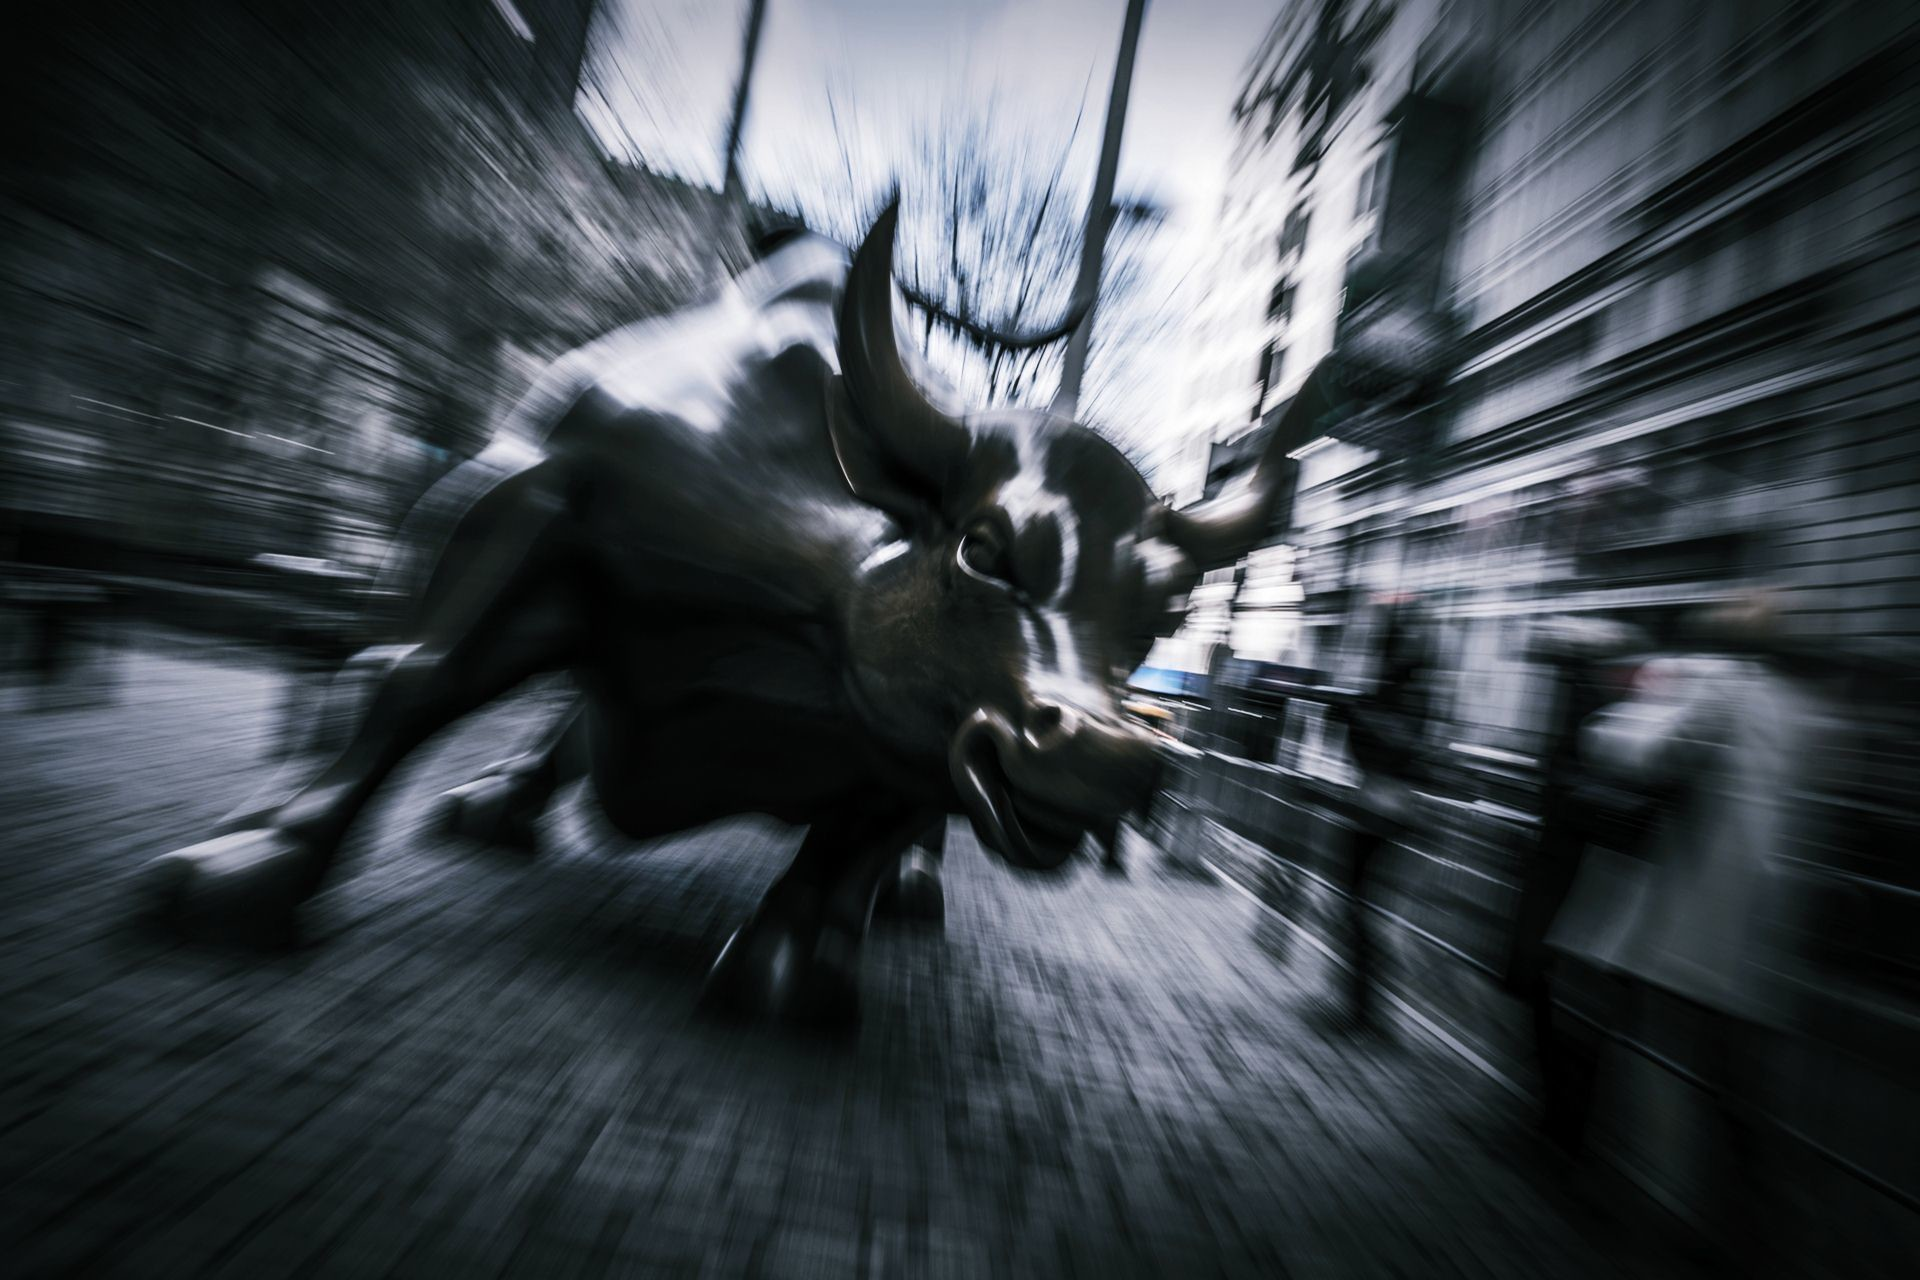 Charging Bull (Wall Street Bull) Art Wallpaper